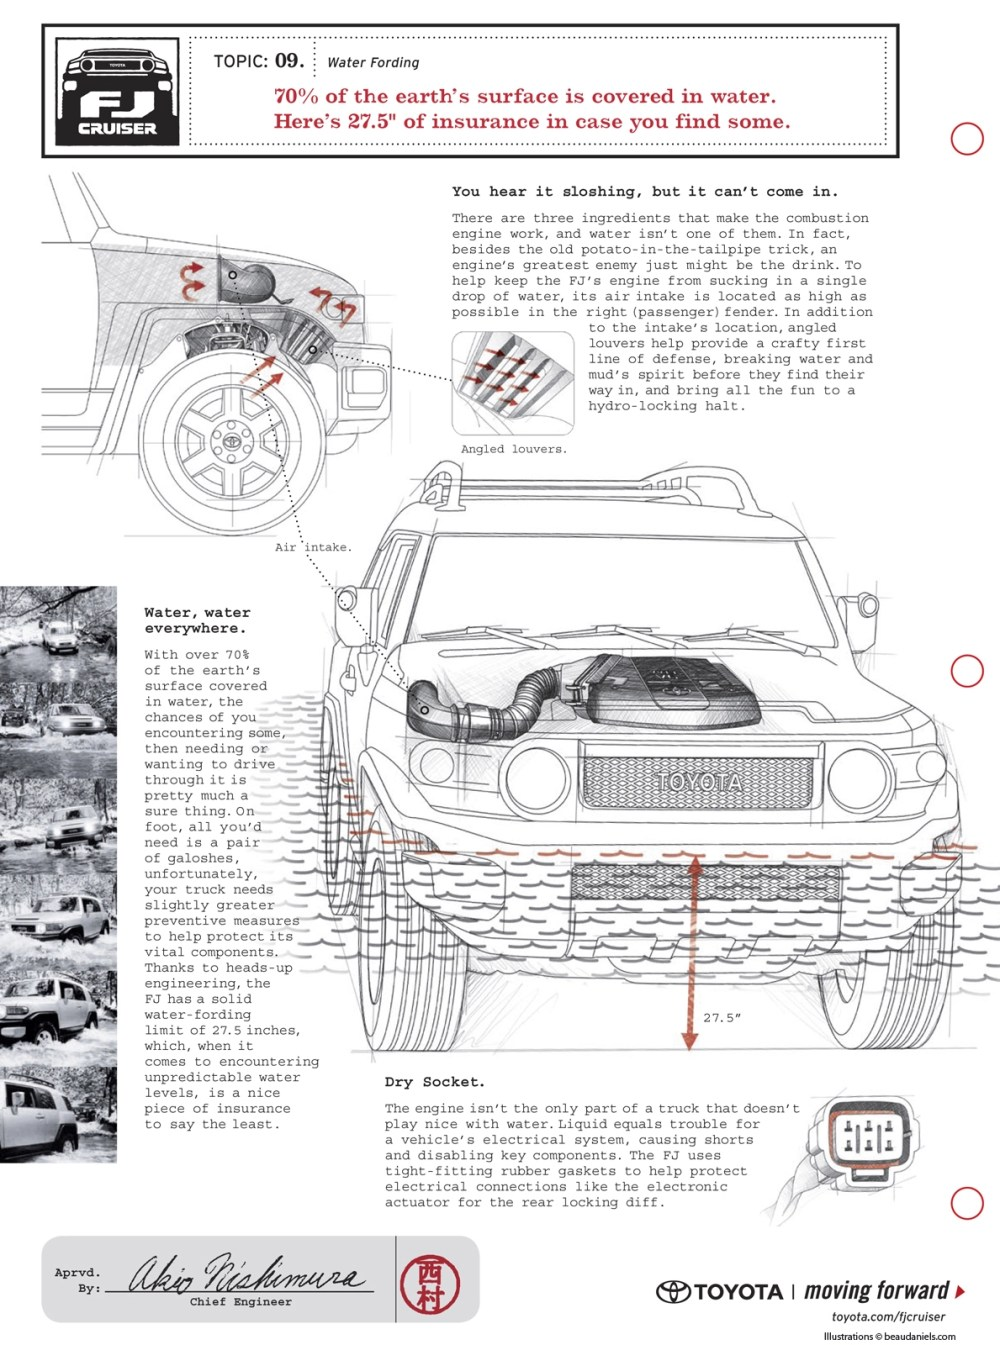 medium resolution of fj cruiser diagram ads toyota fj cruiser forumclick image for larger version name ghosted technical illustration